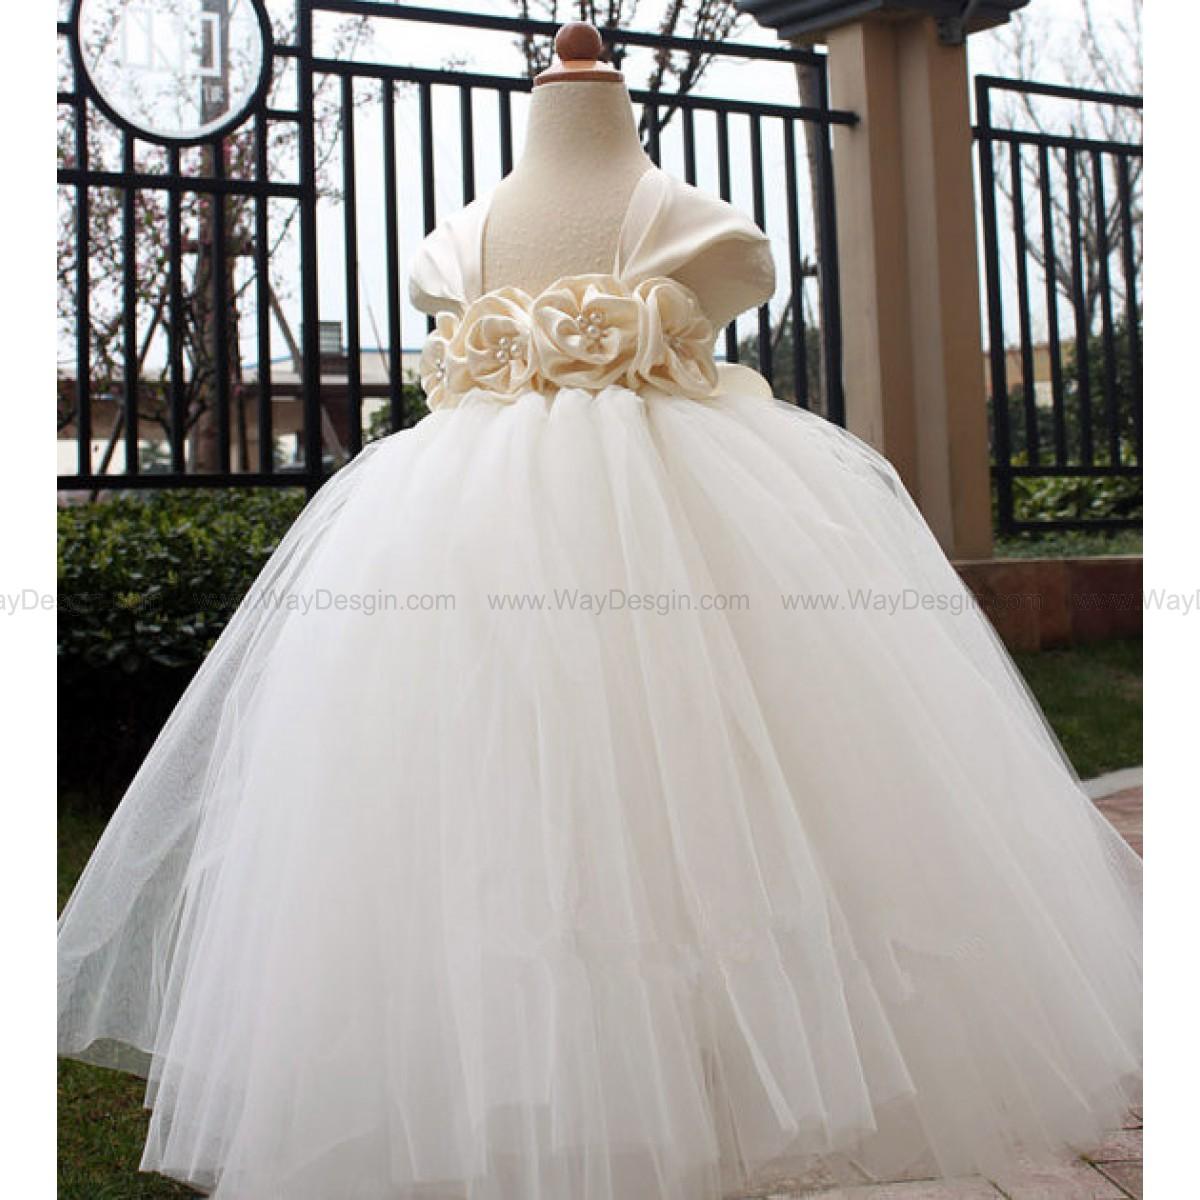 Ivory Flower Girl Dress Ivory tutu dress baby dress toddler birthday dress wedding dress